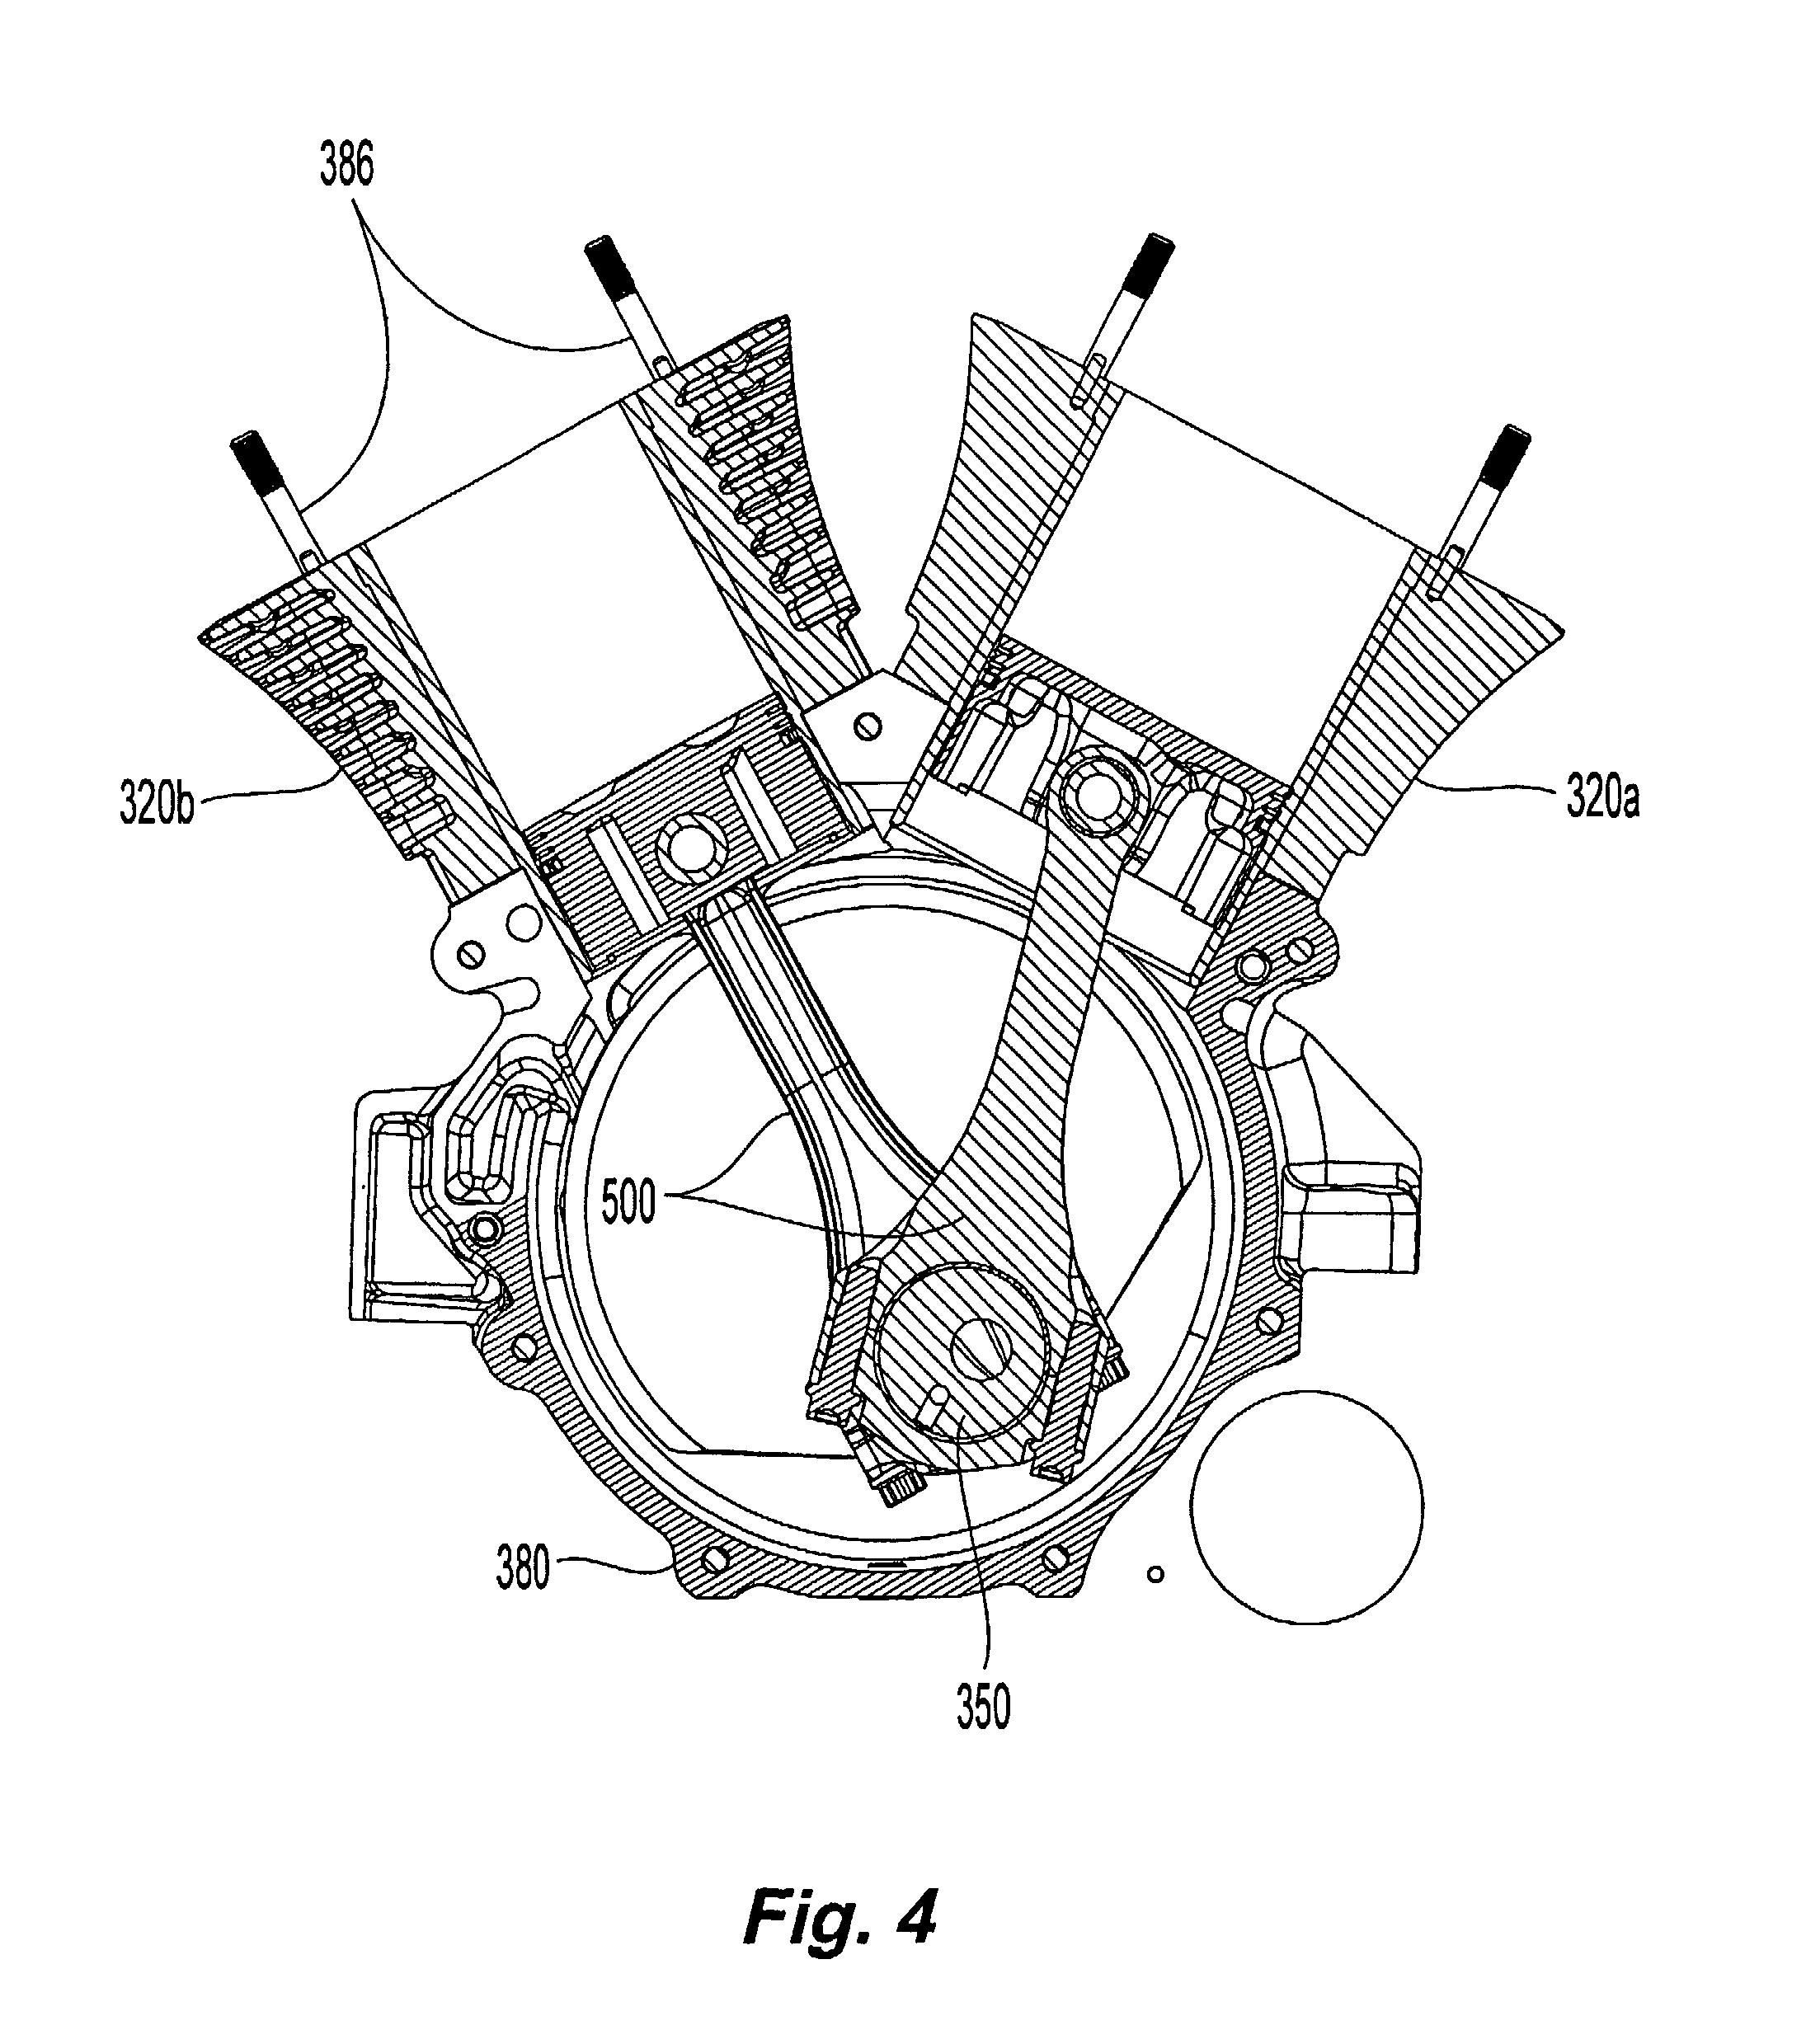 Wiring Diagram For Pumptrol Pressure Switch. Wiring